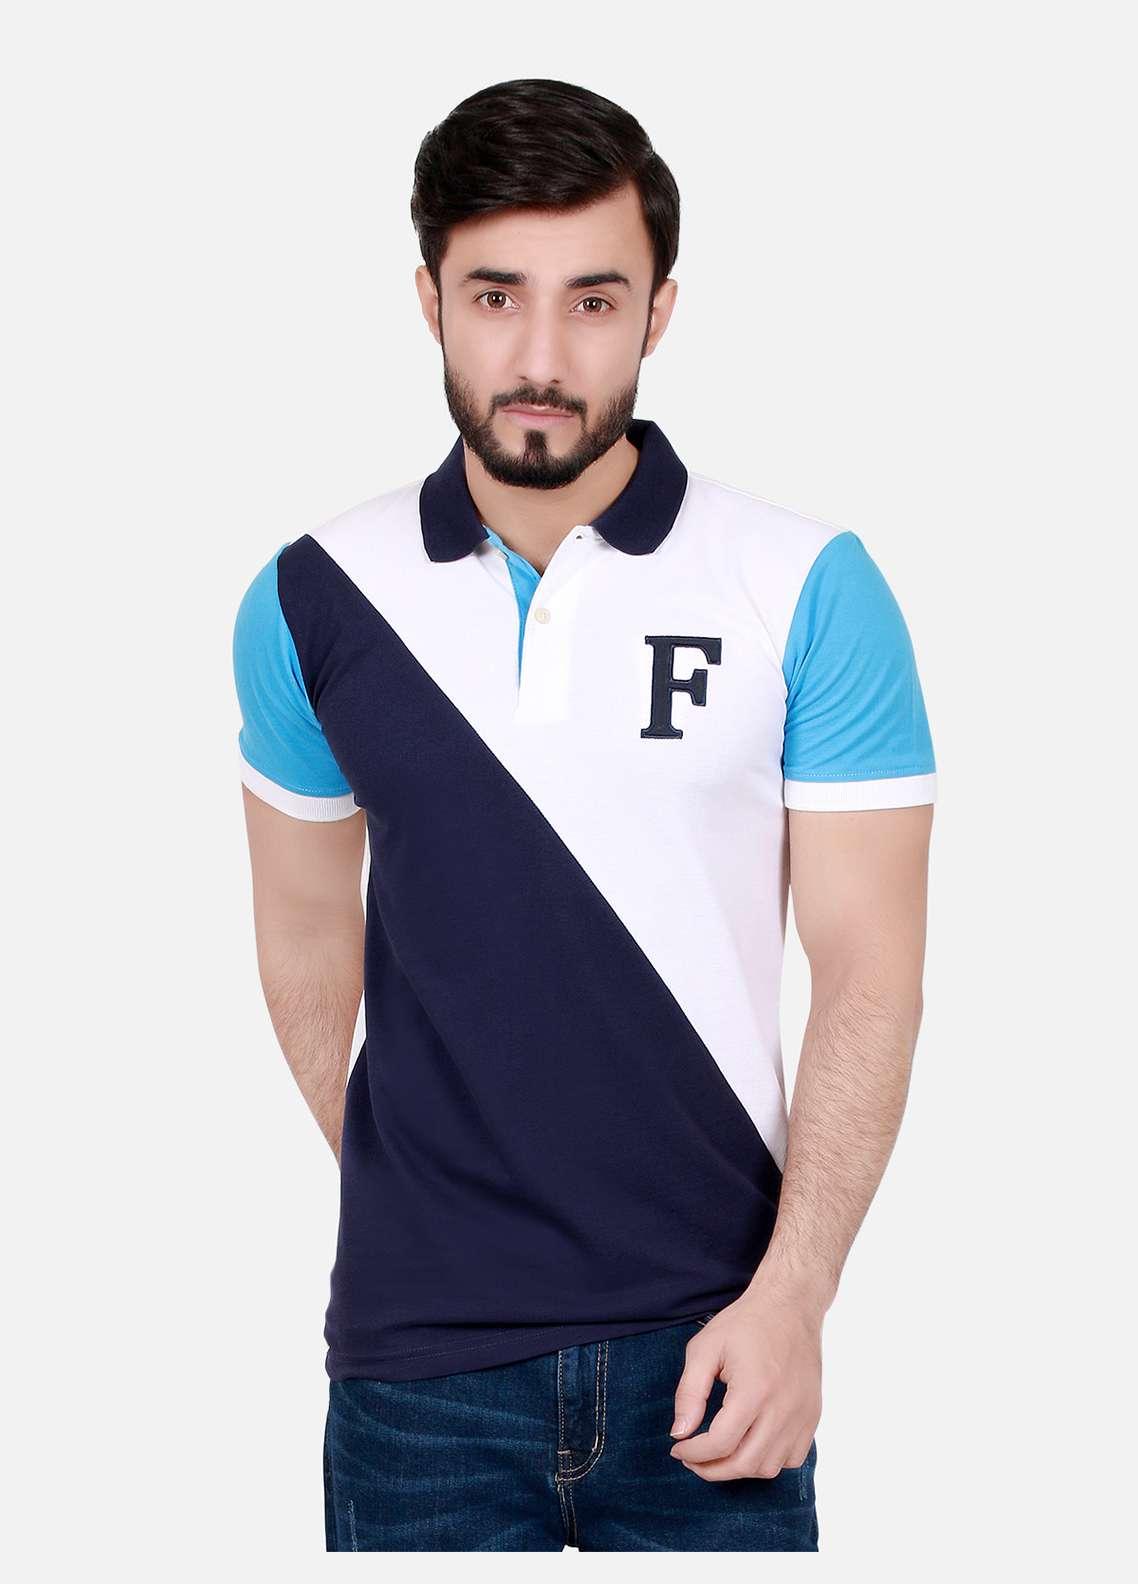 Furor Cotton Polo T-Shirts for Men - Multi FRM18PS 006